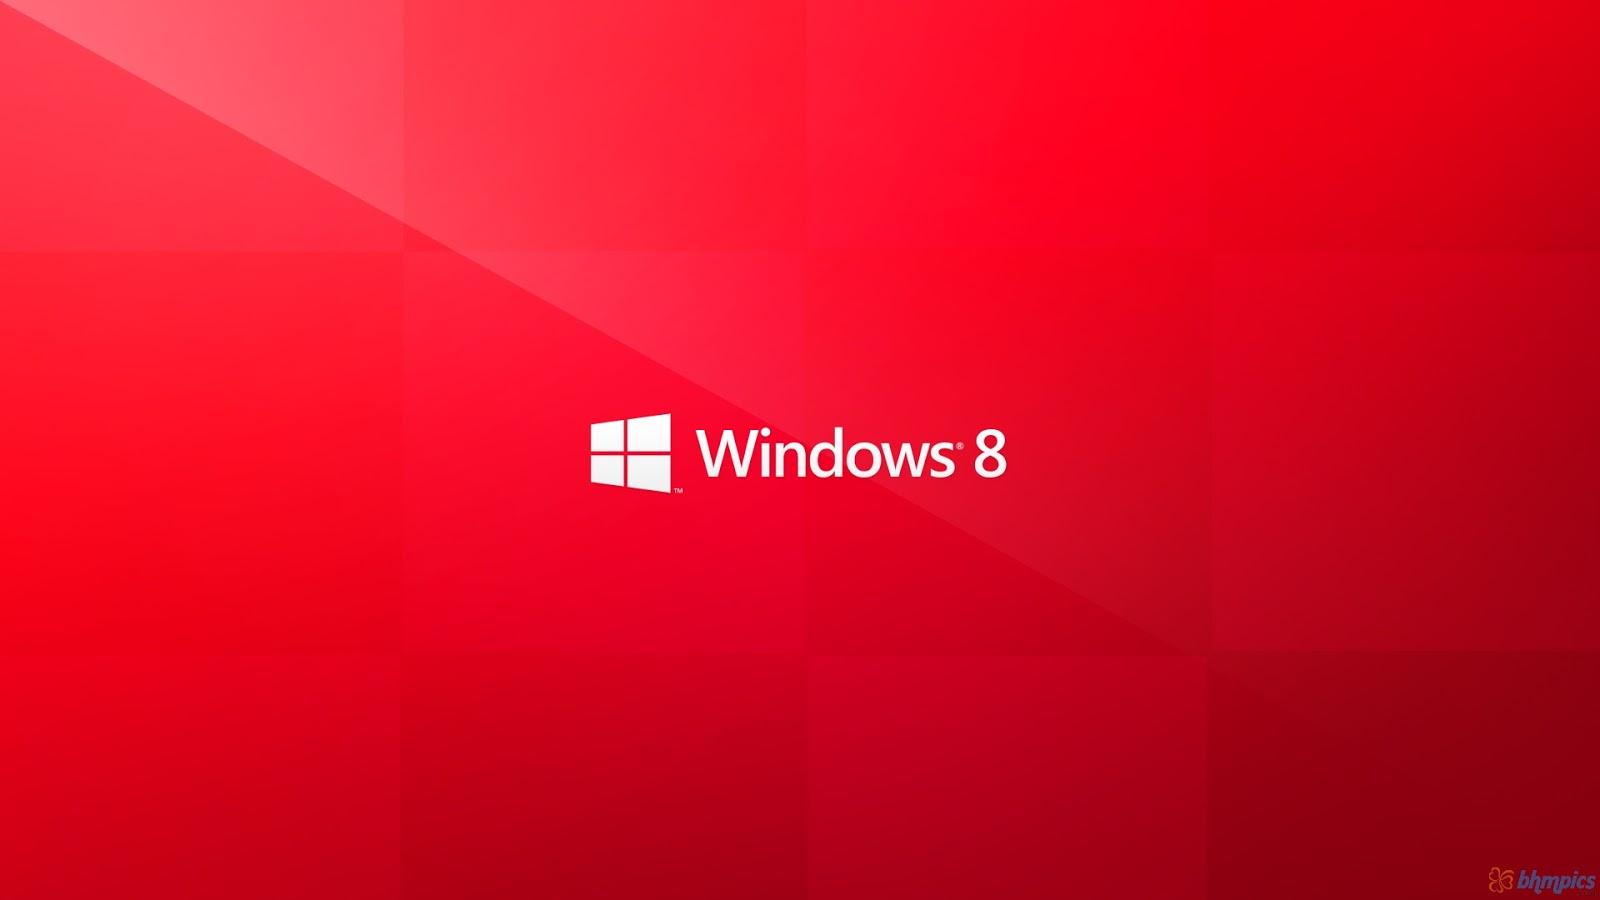 windows 81 wallpapers for laptop wallpapersafari